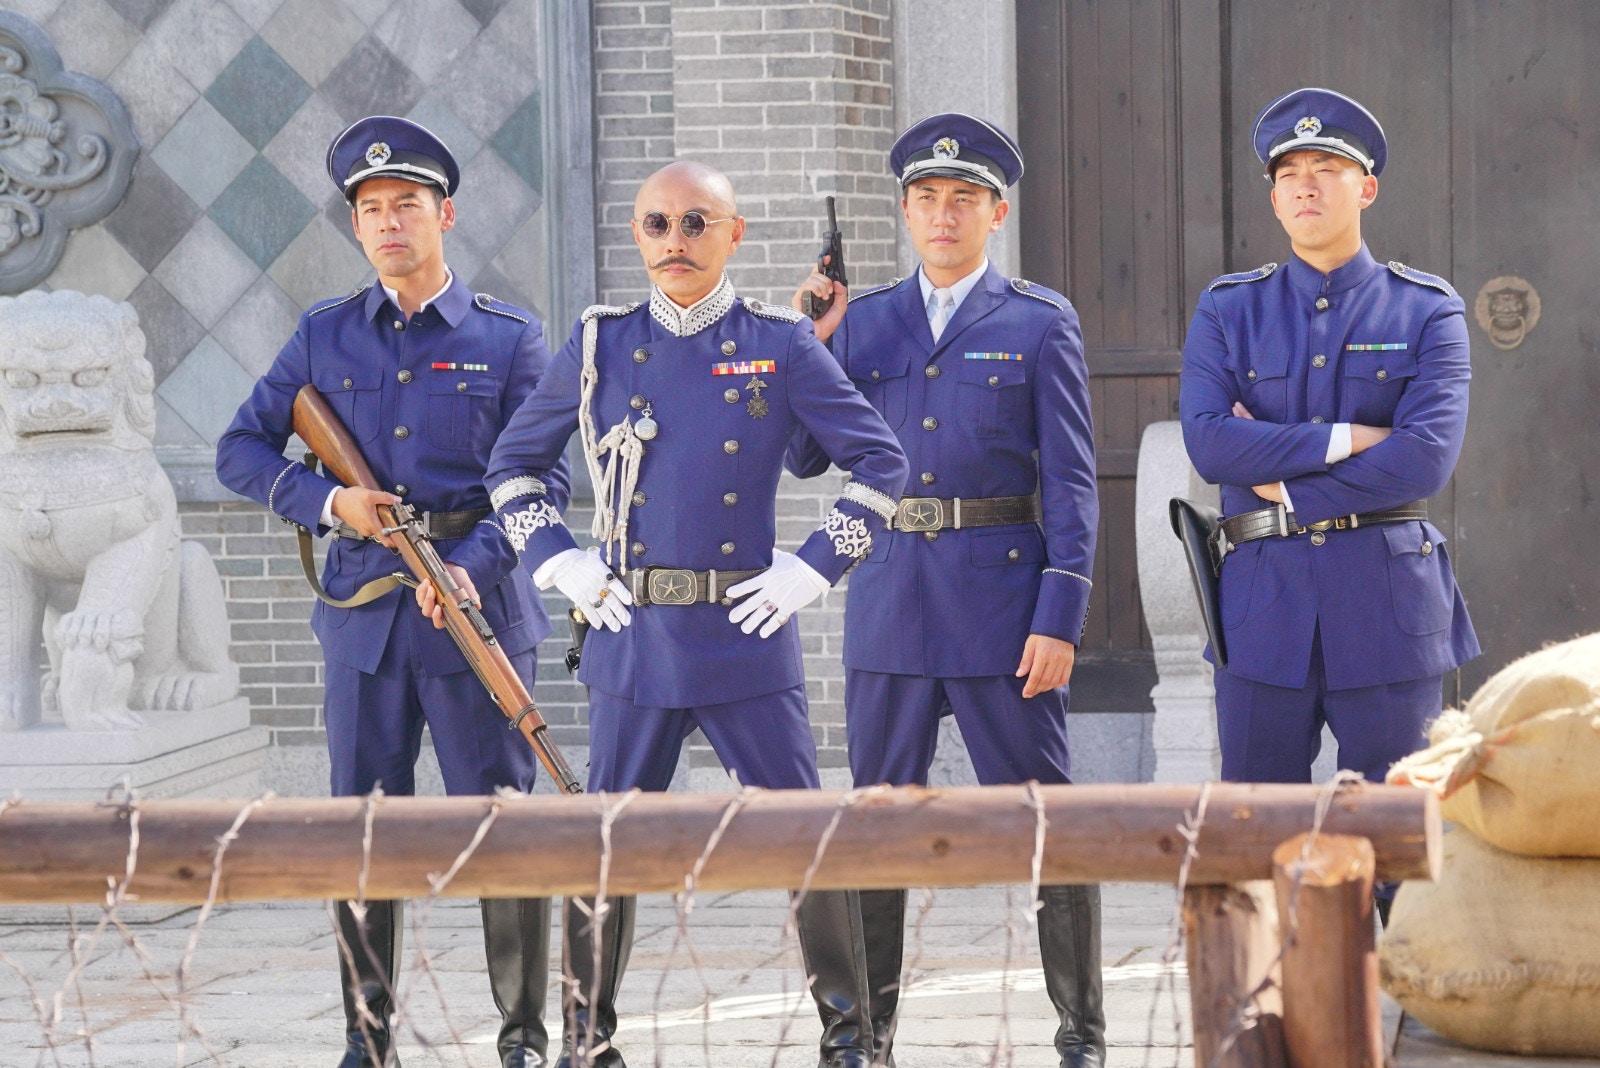 TVB热播剧《大帅哥》 | 盘点张卫健剧中20大金句,谁大谁恶谁正确超洗脑的啦!